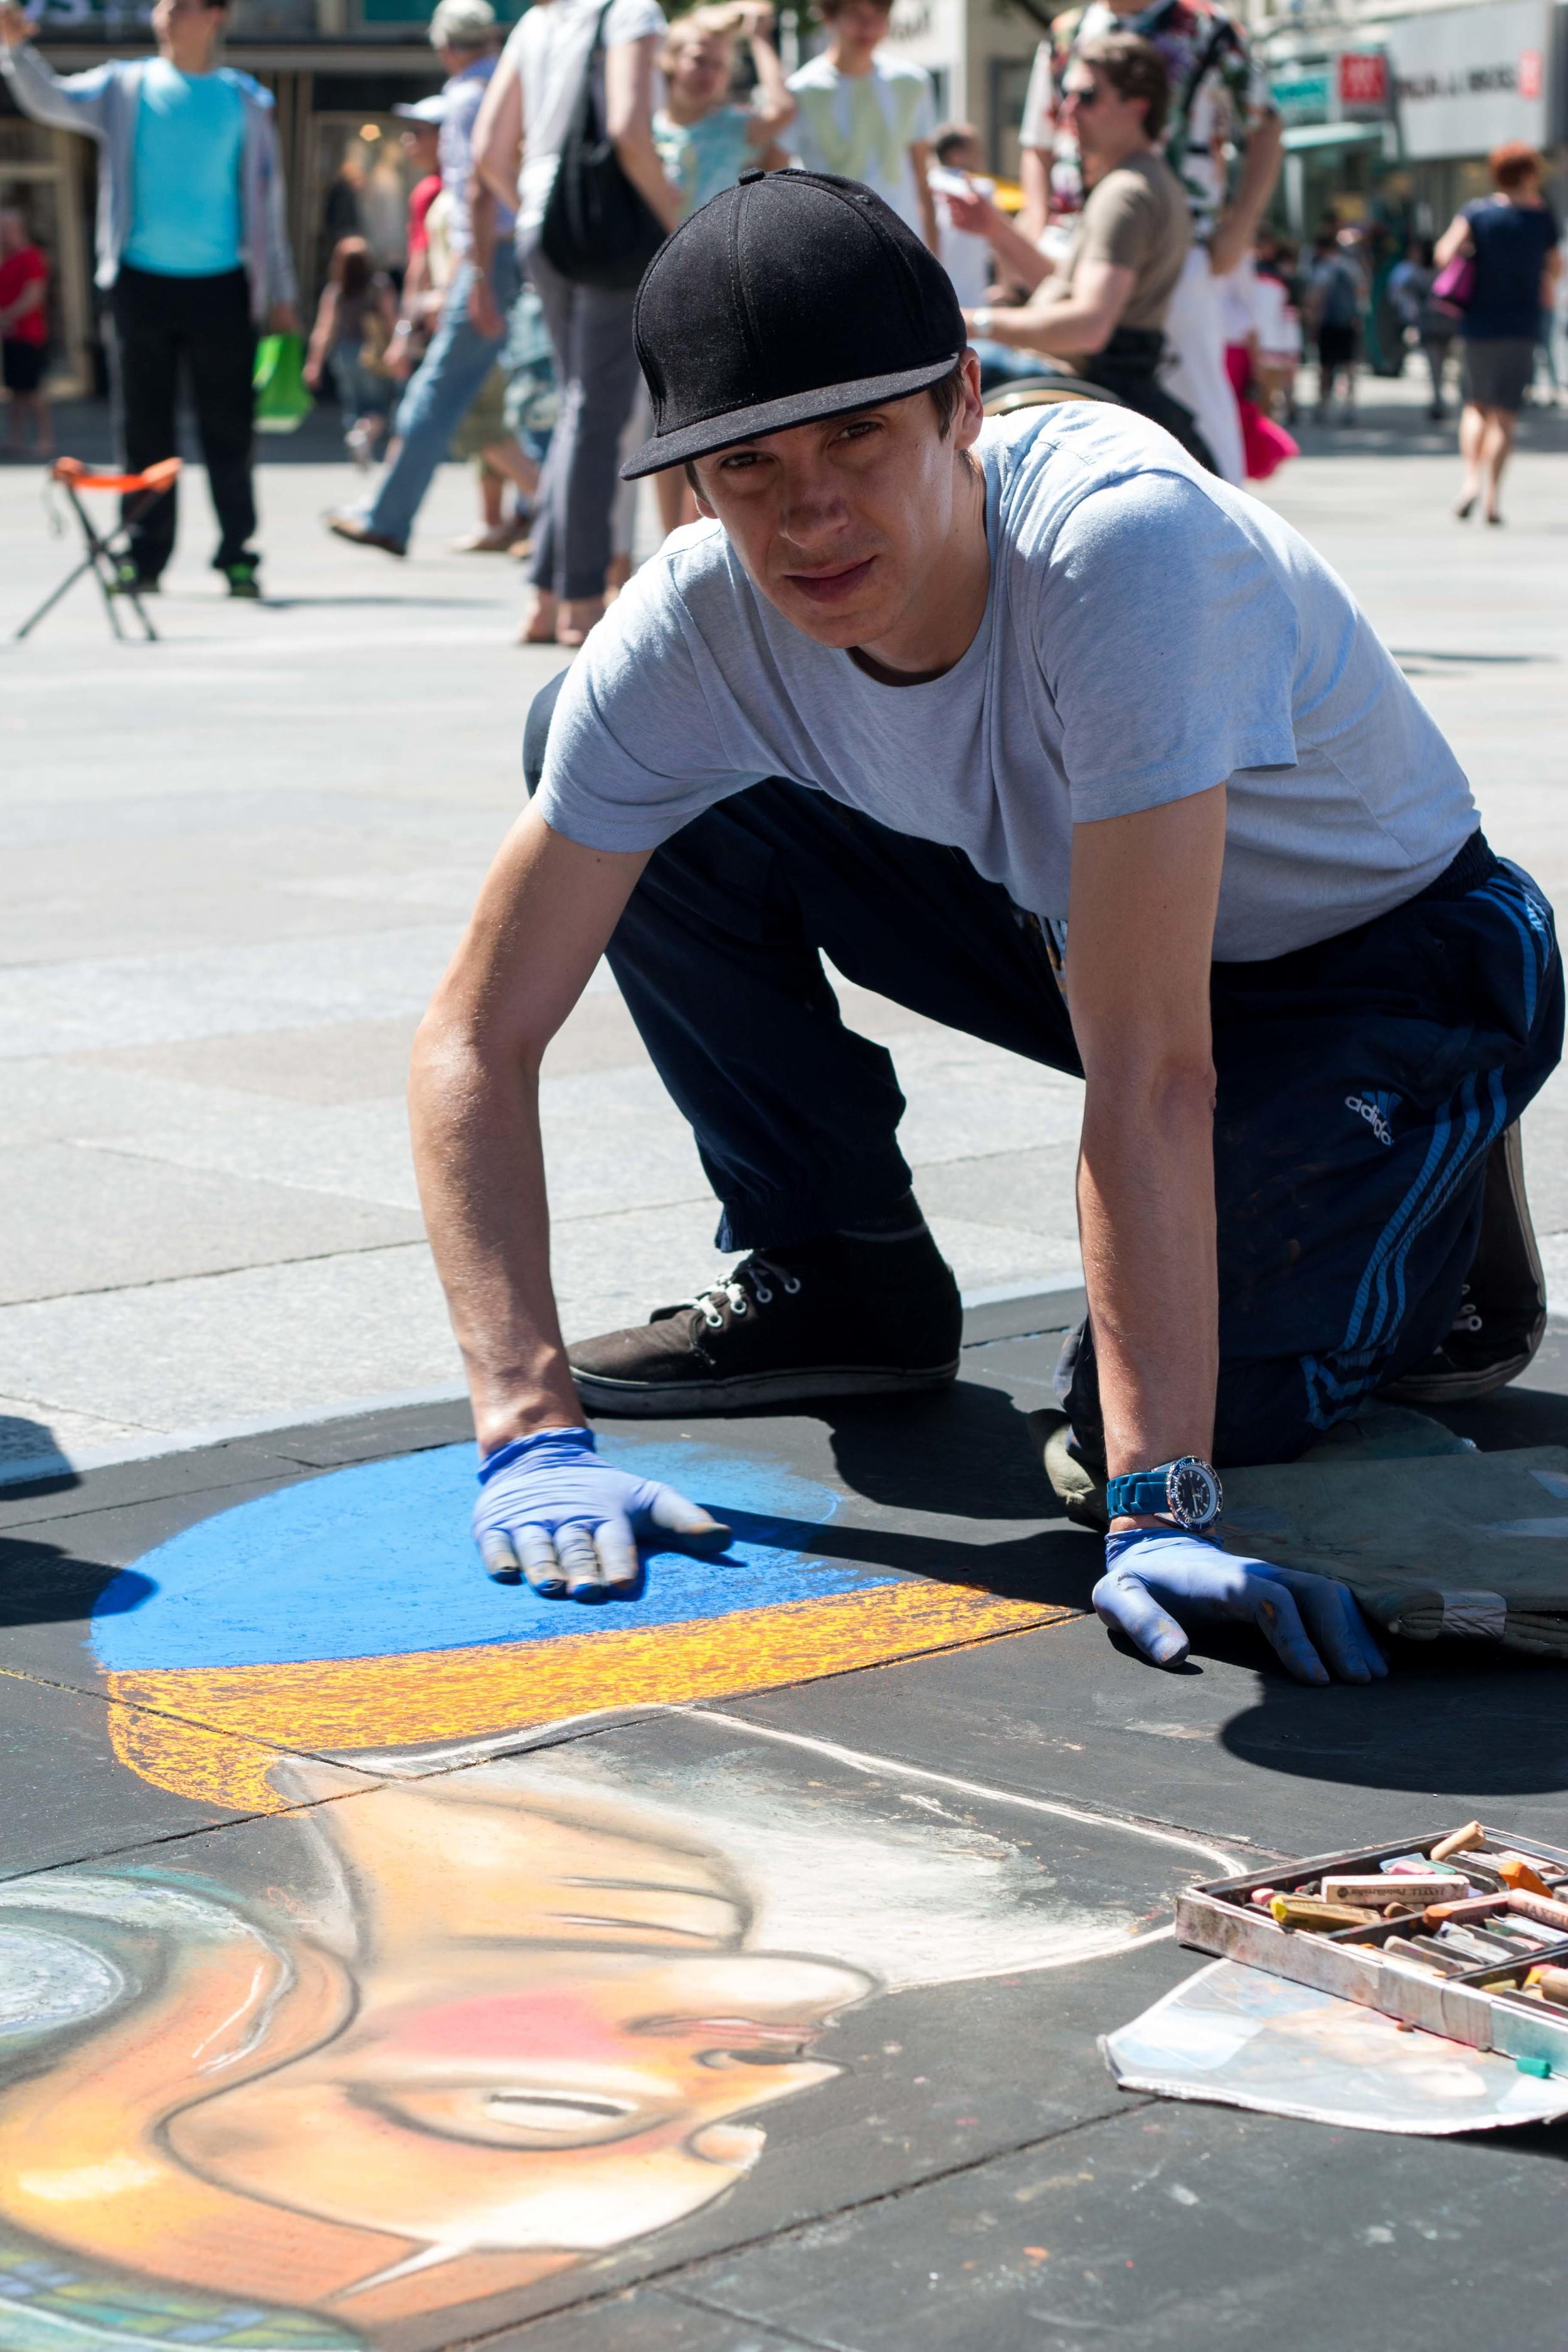 Street artist working on an amazing chalk painting